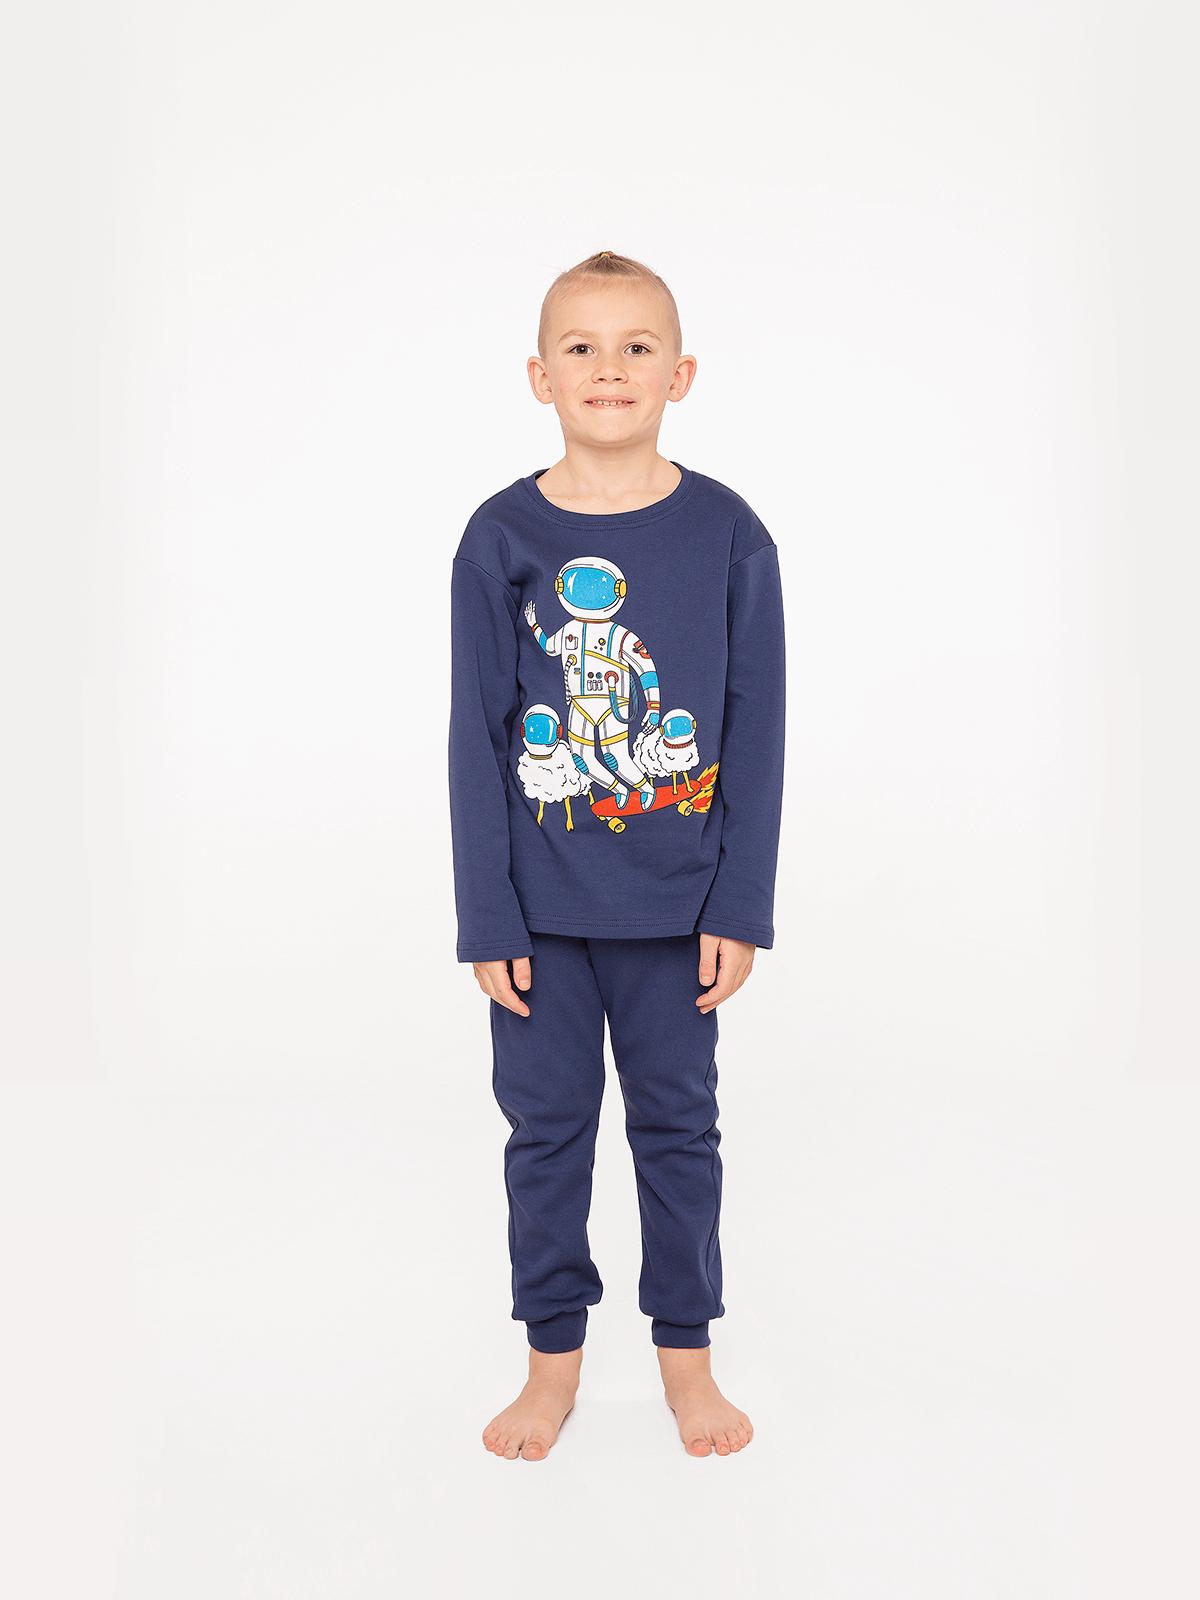 Kids Pajamas Space Shepherd. Color navy blue.  Technique of prints applied: silkscreen printing.